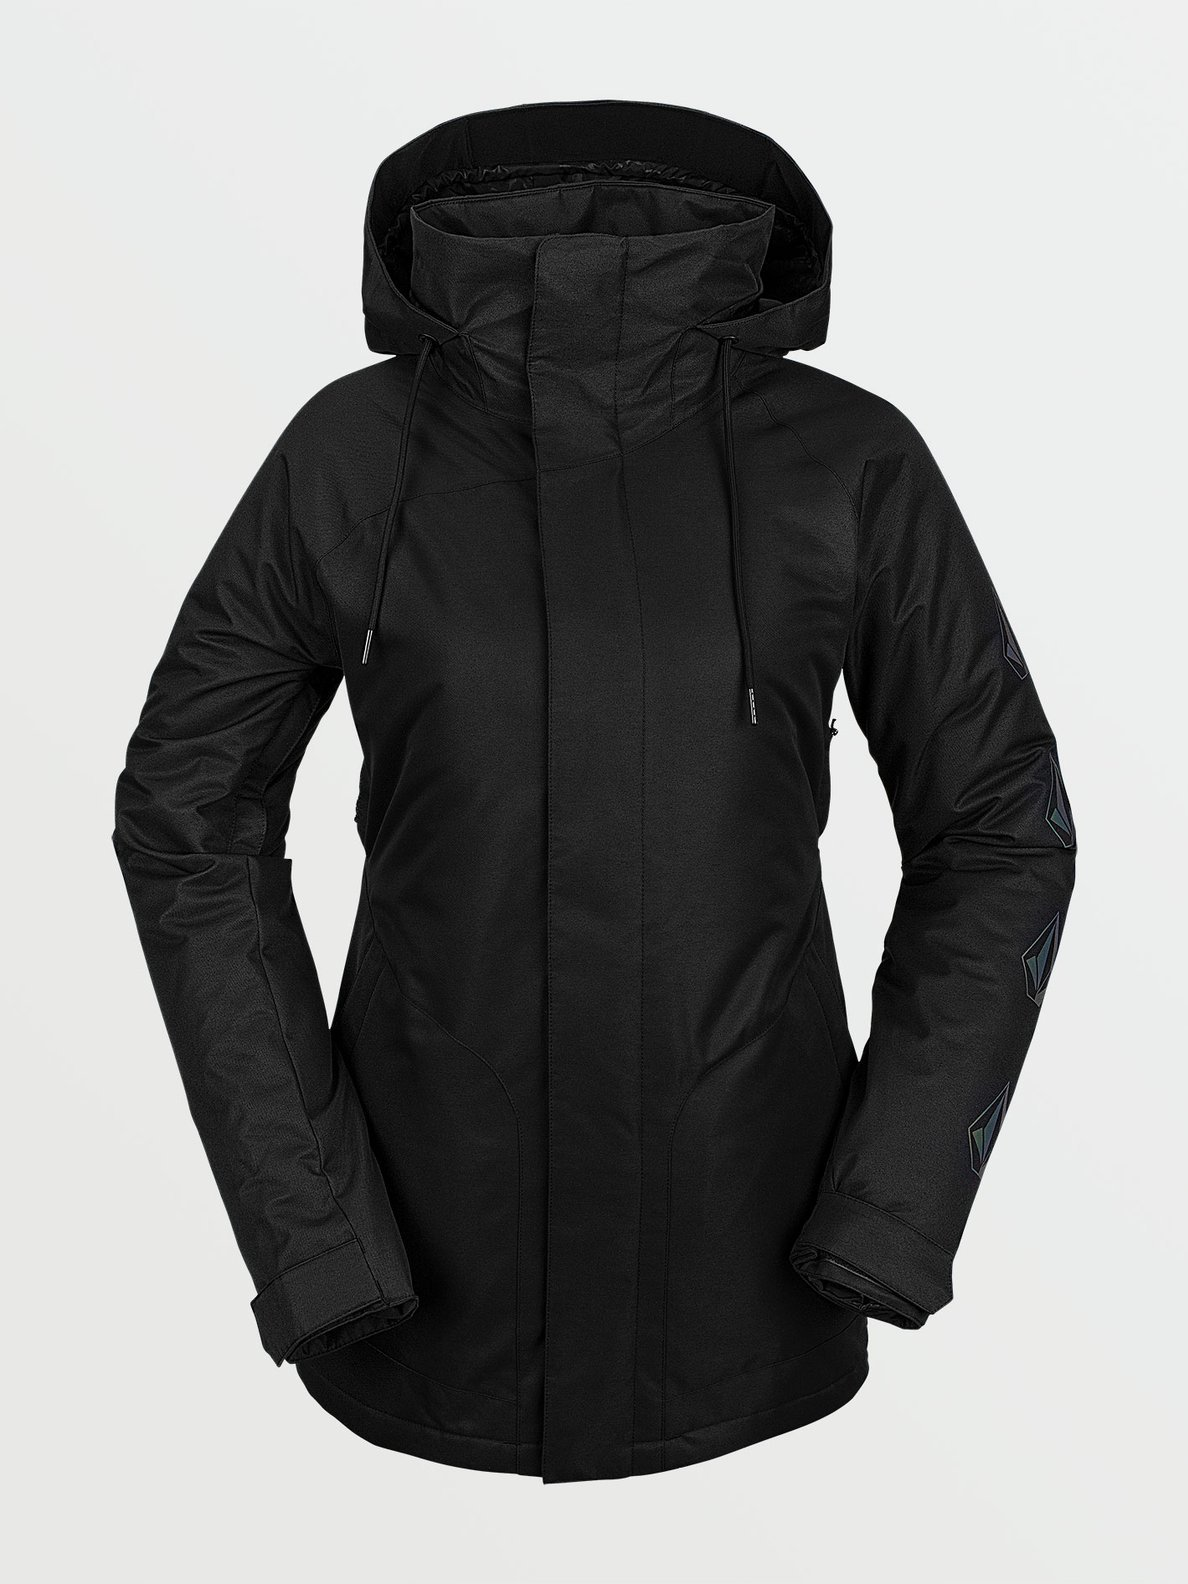 Volcom Westland Insulated Jacket